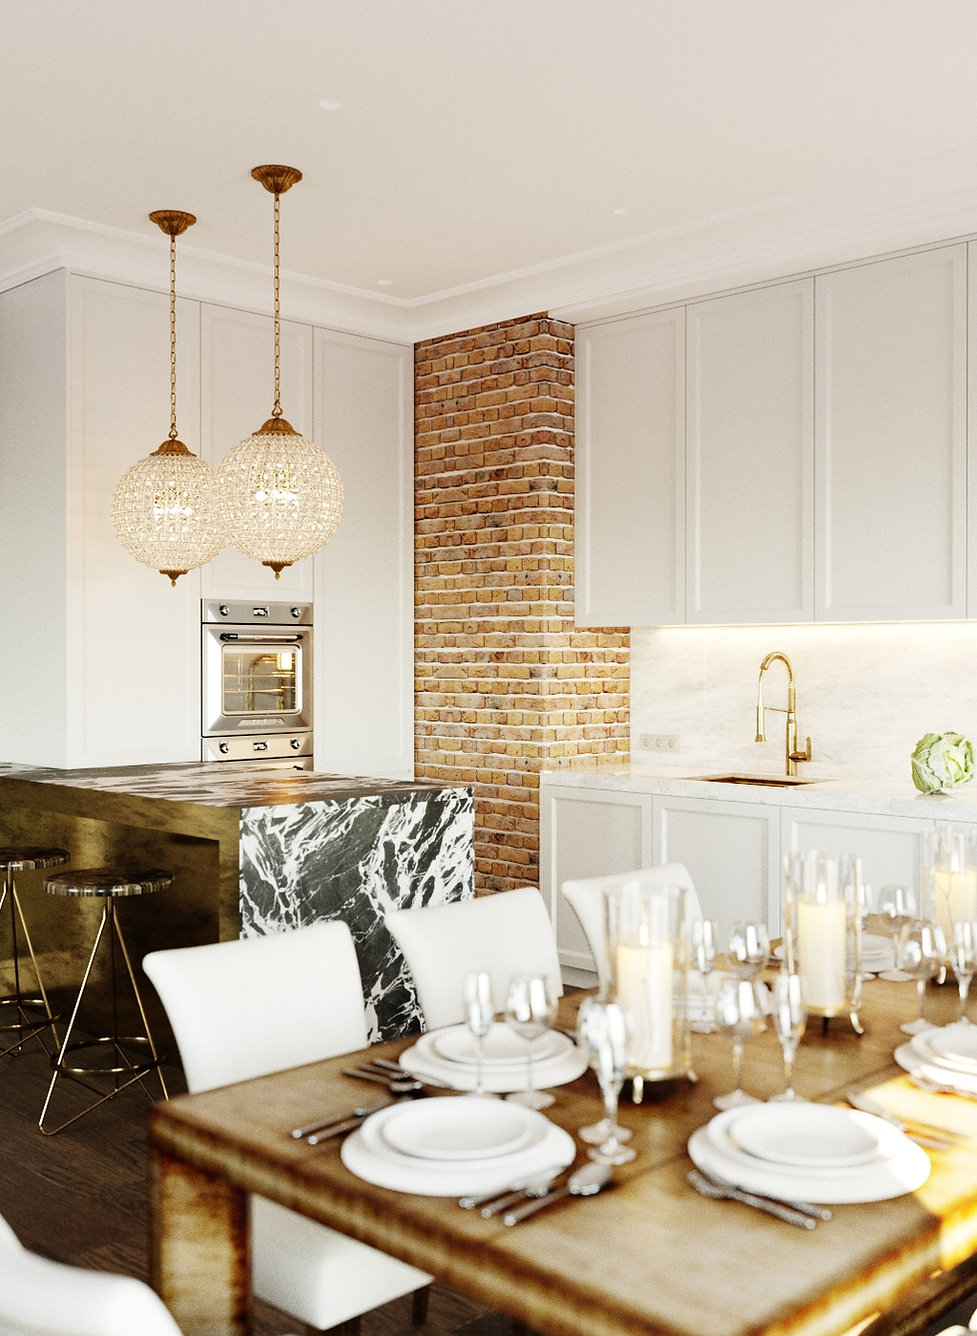 кухня-гостиная картинка 24.jpg